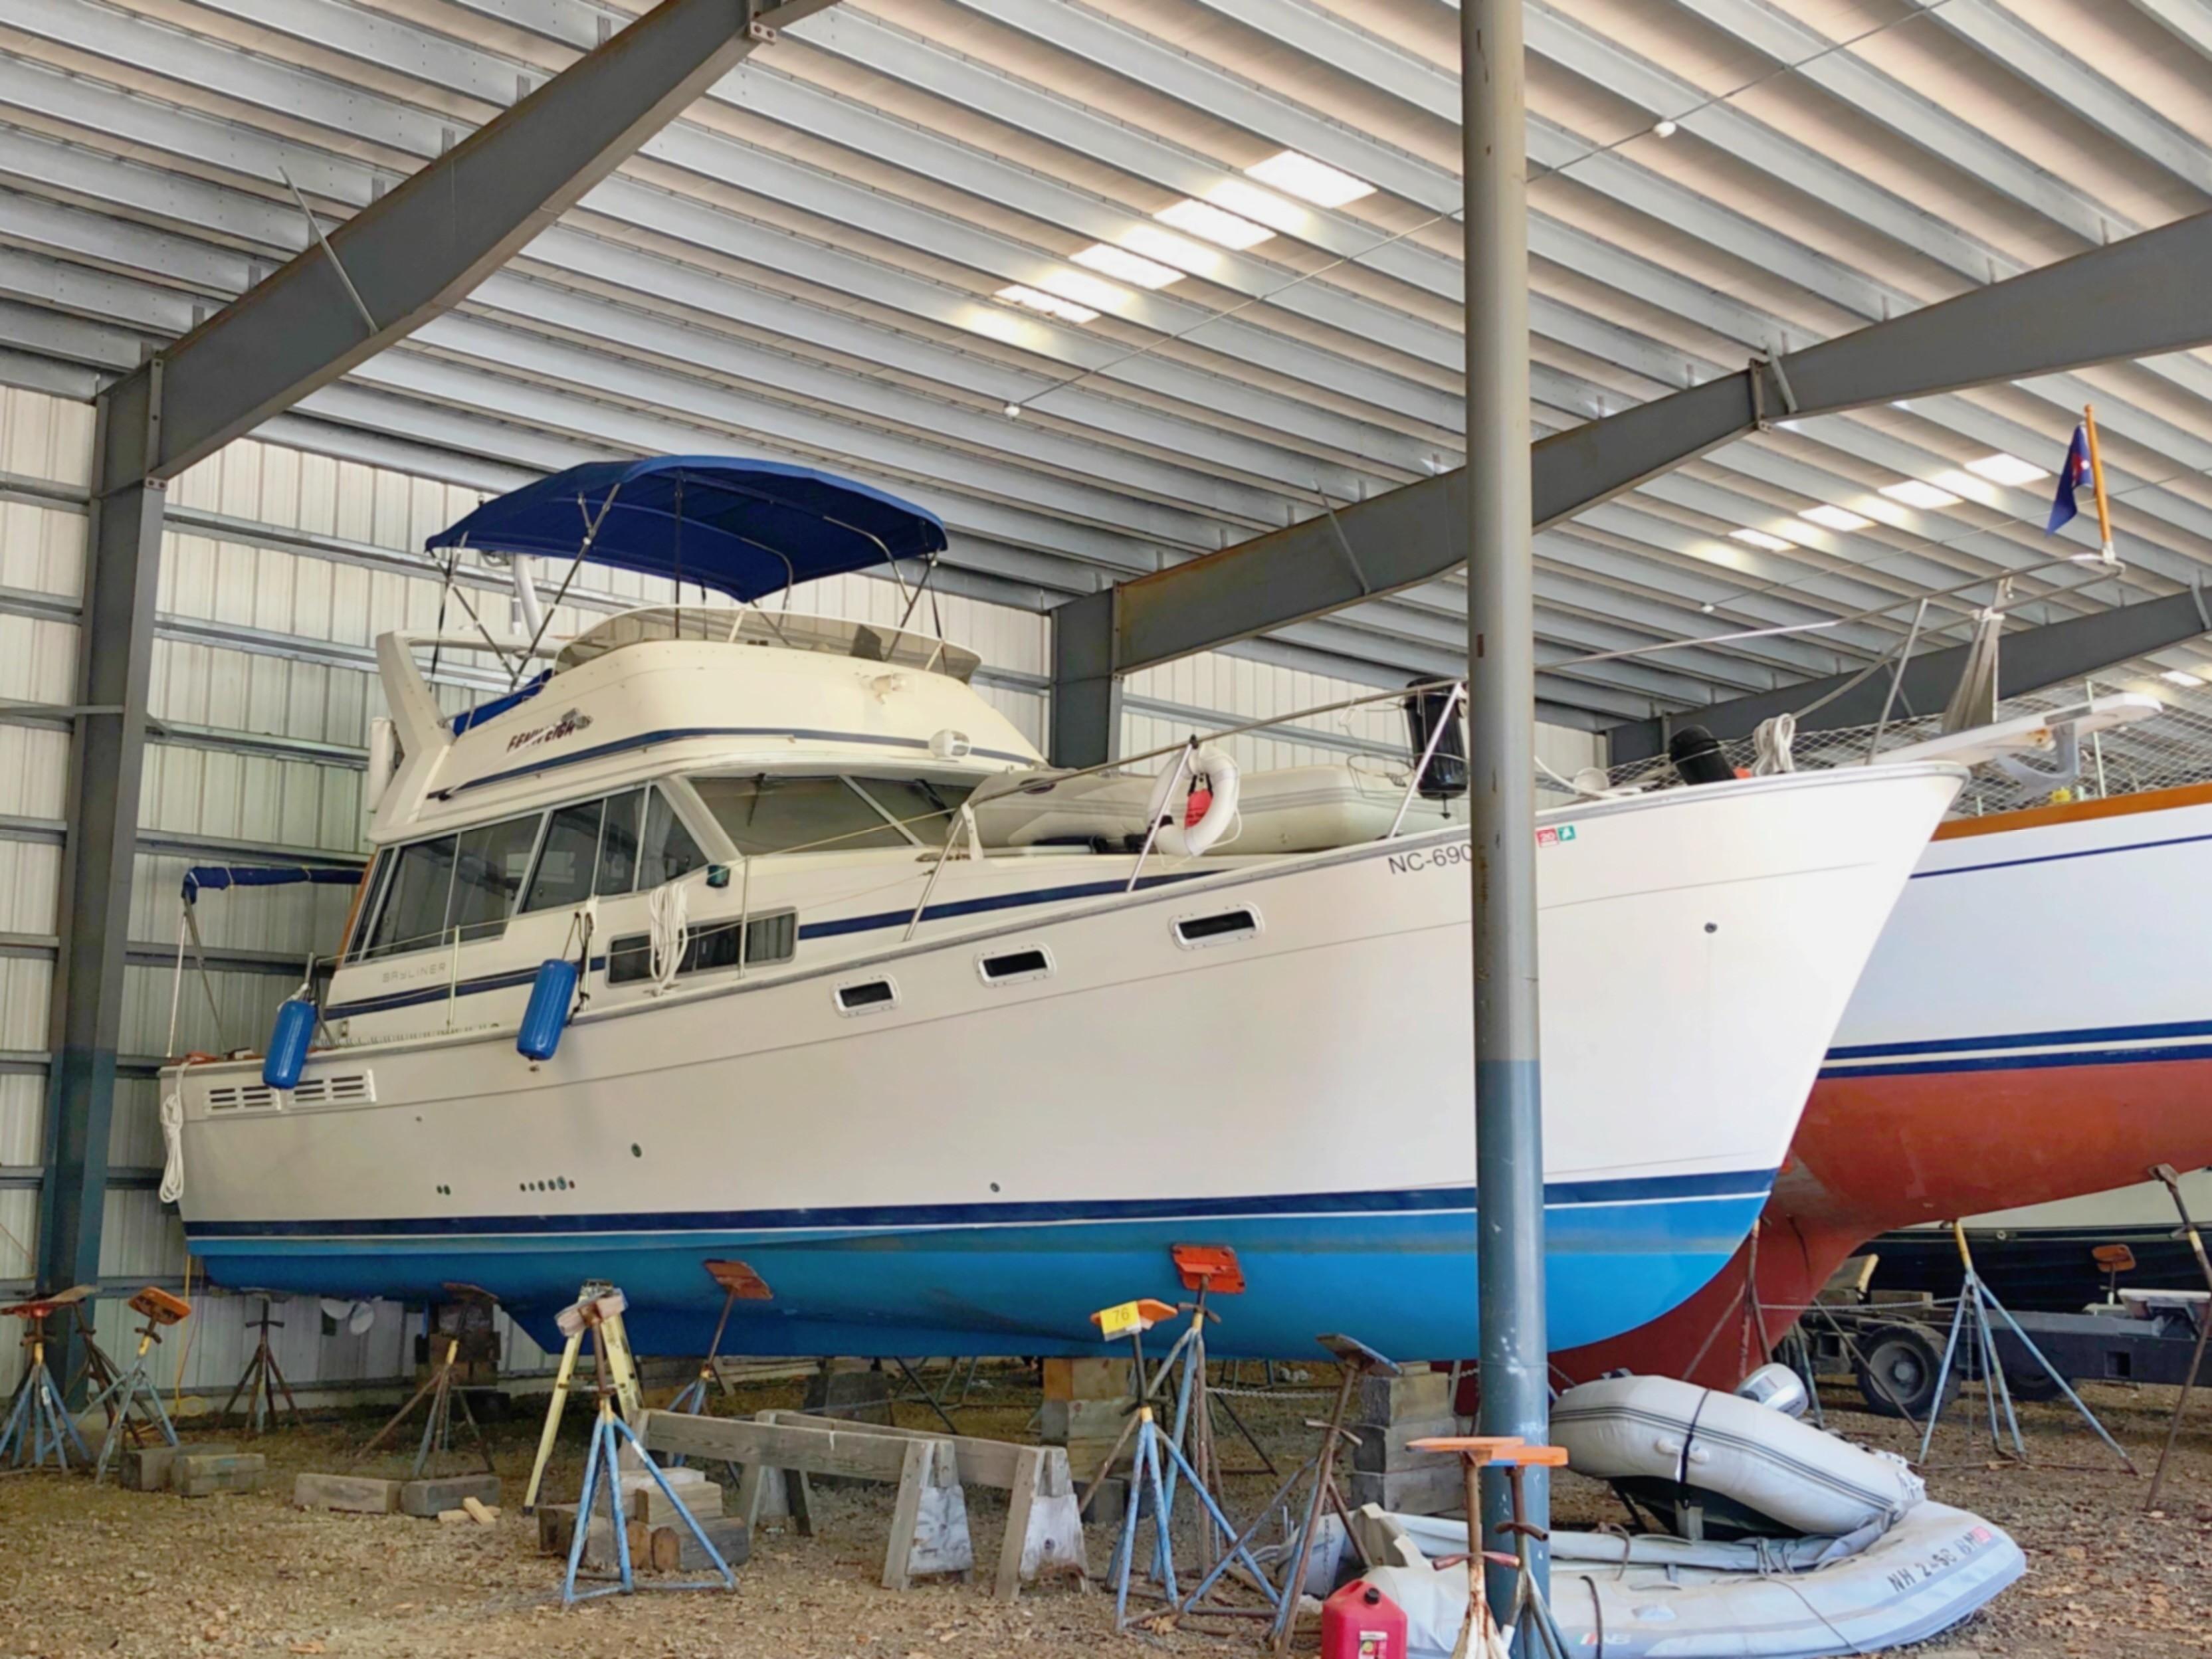 200 Model Boat Fittings. Set of 3. Boathooks